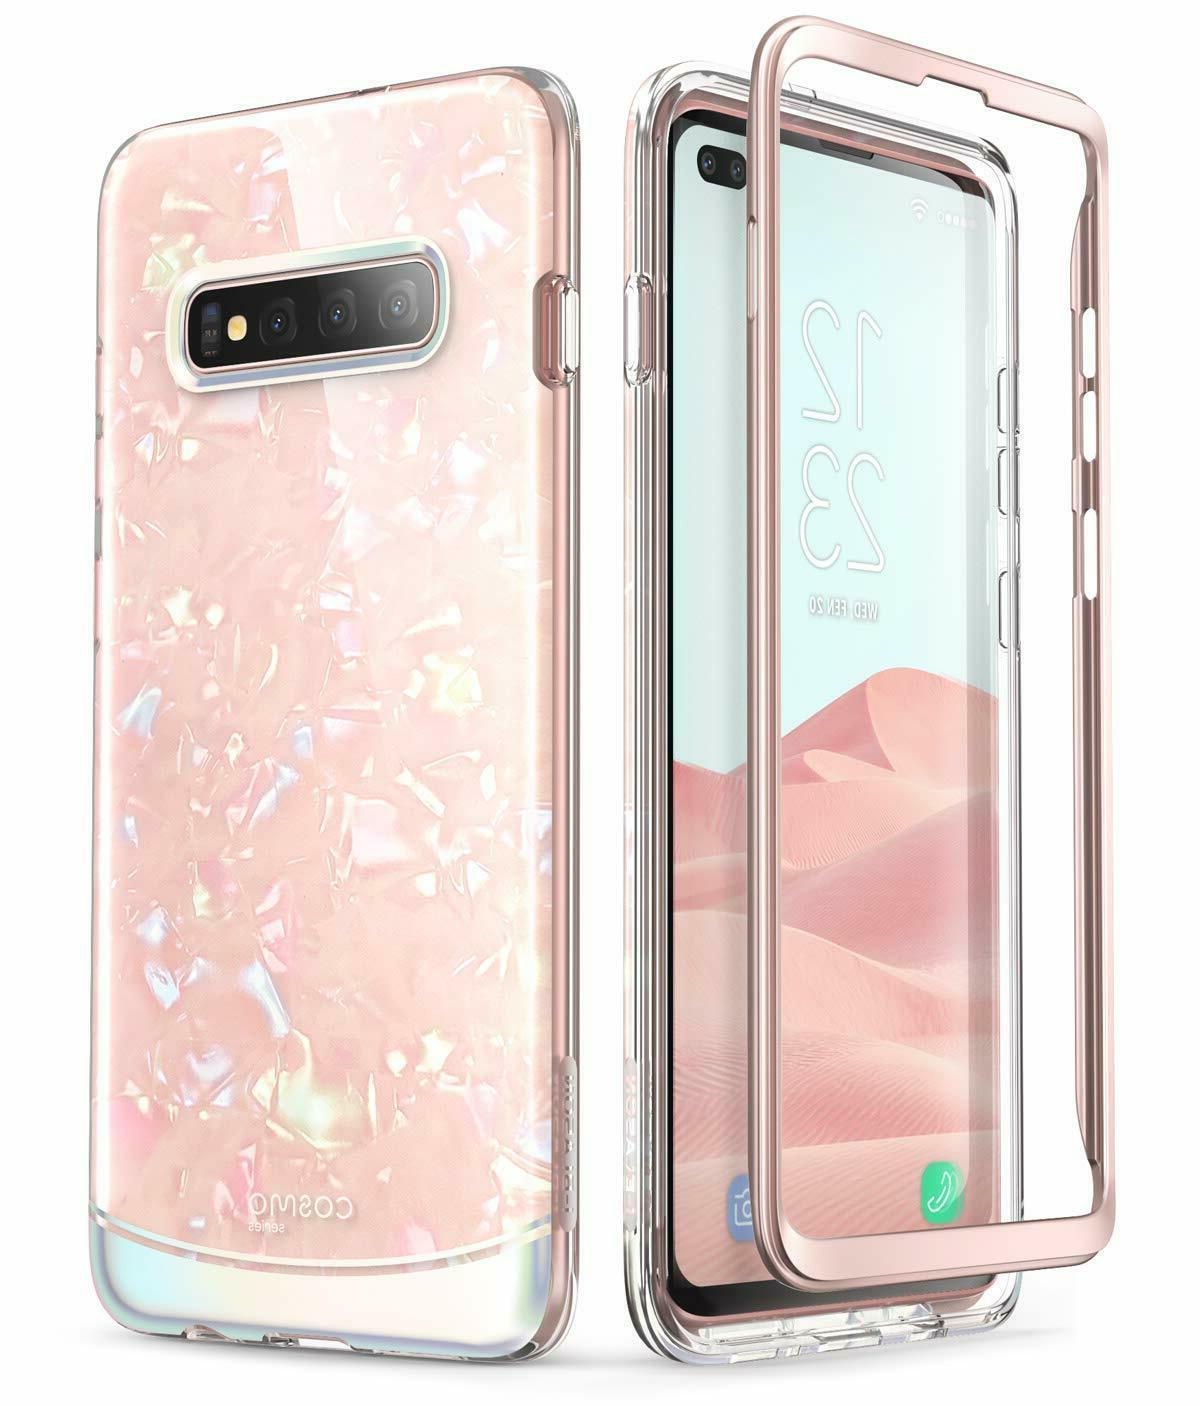 Samsung S10 Case, Protective Shockproof